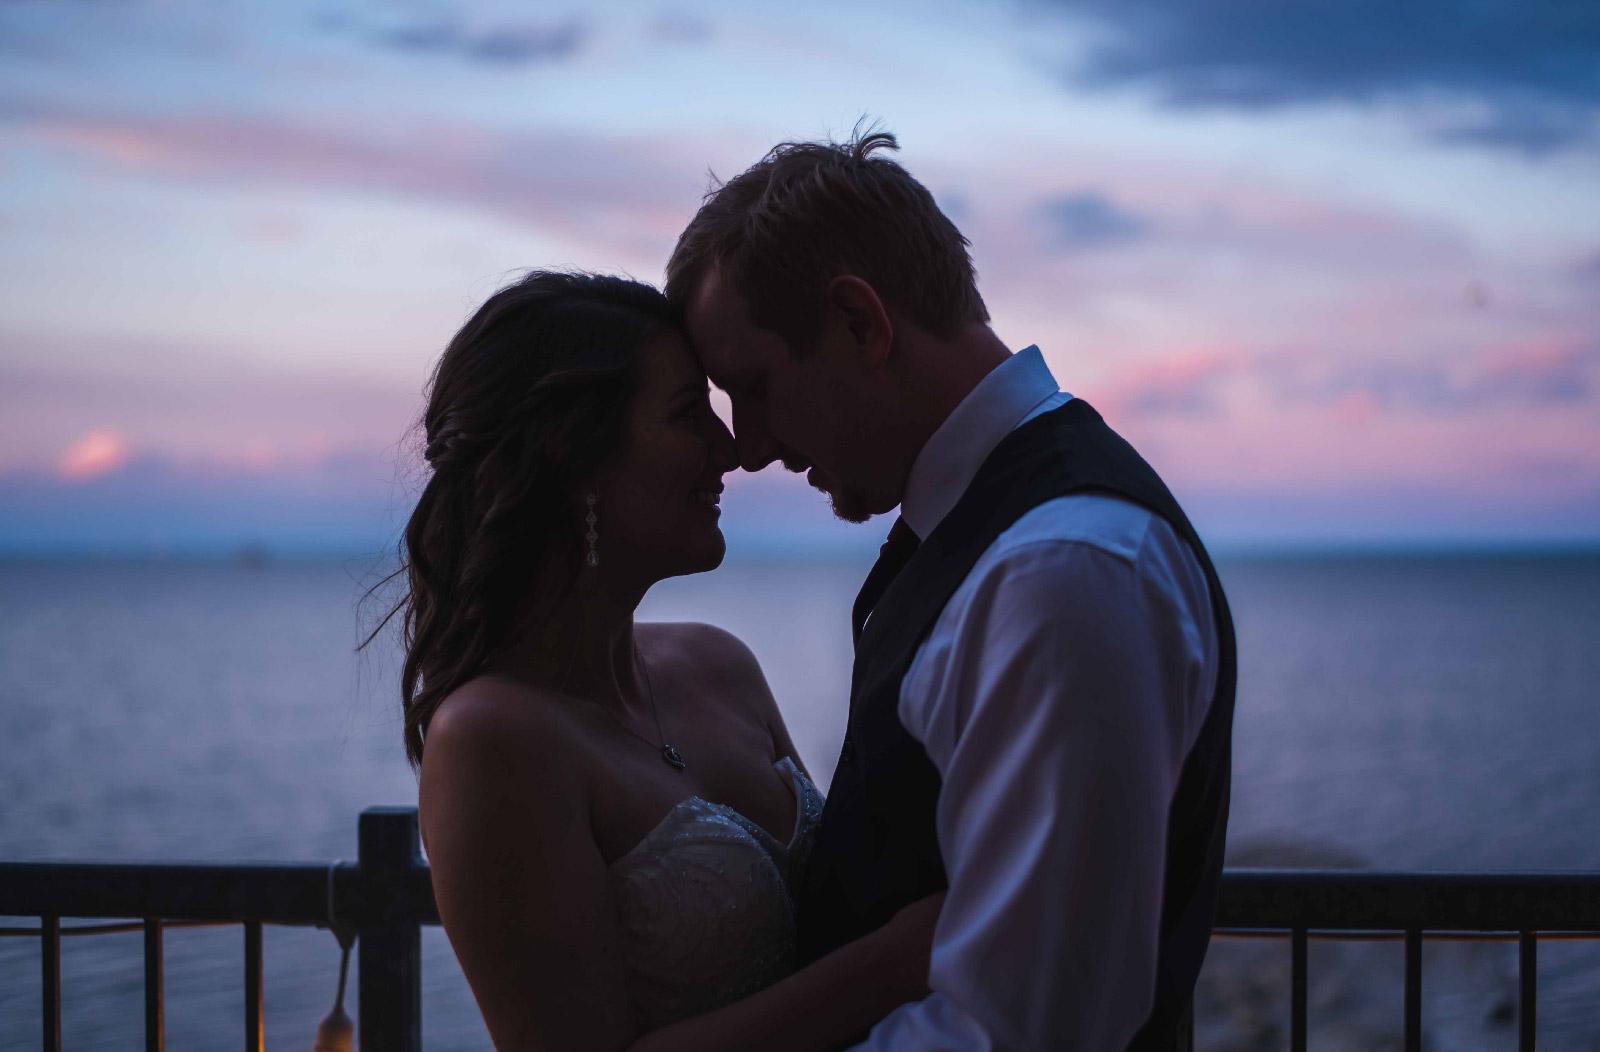 Noah & Caitlin's Sunset Photo Hush Hush Photography & Film Aidan Hennebry Hamilton Wedding Photographer Videographer-01.jpg